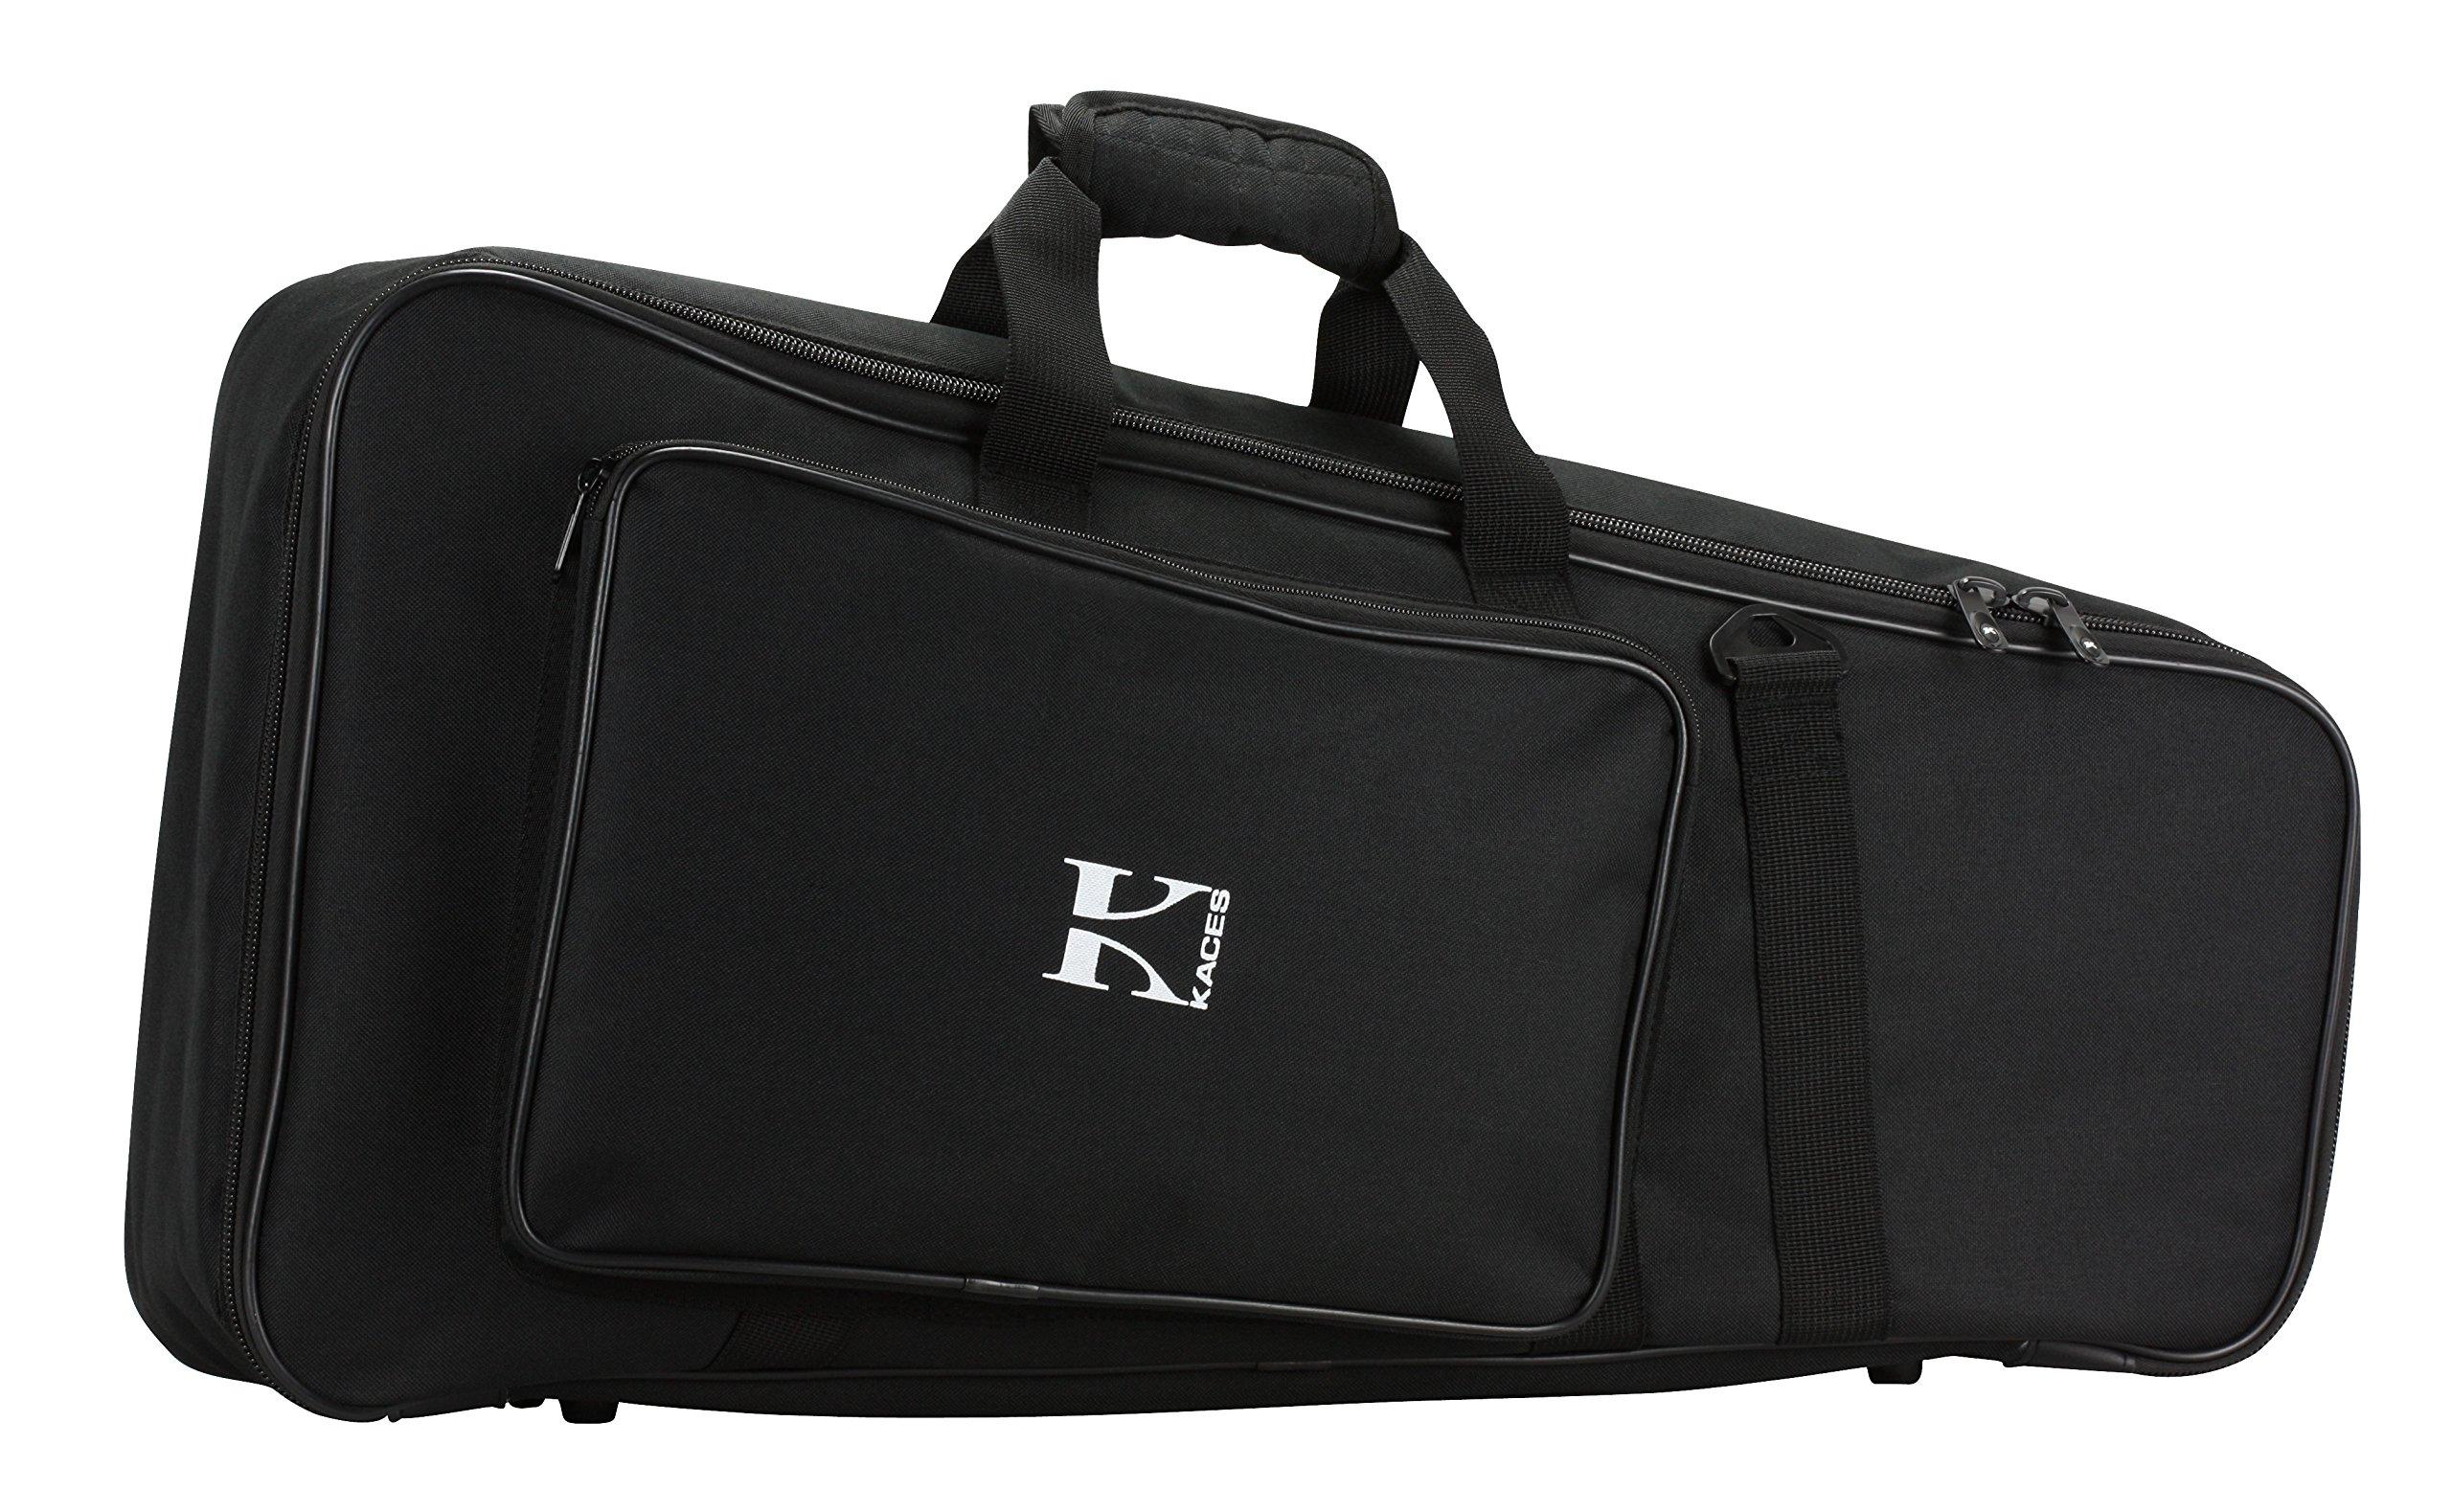 Kaces Universal Bell Kit Bag (KUBK20) by Kaces